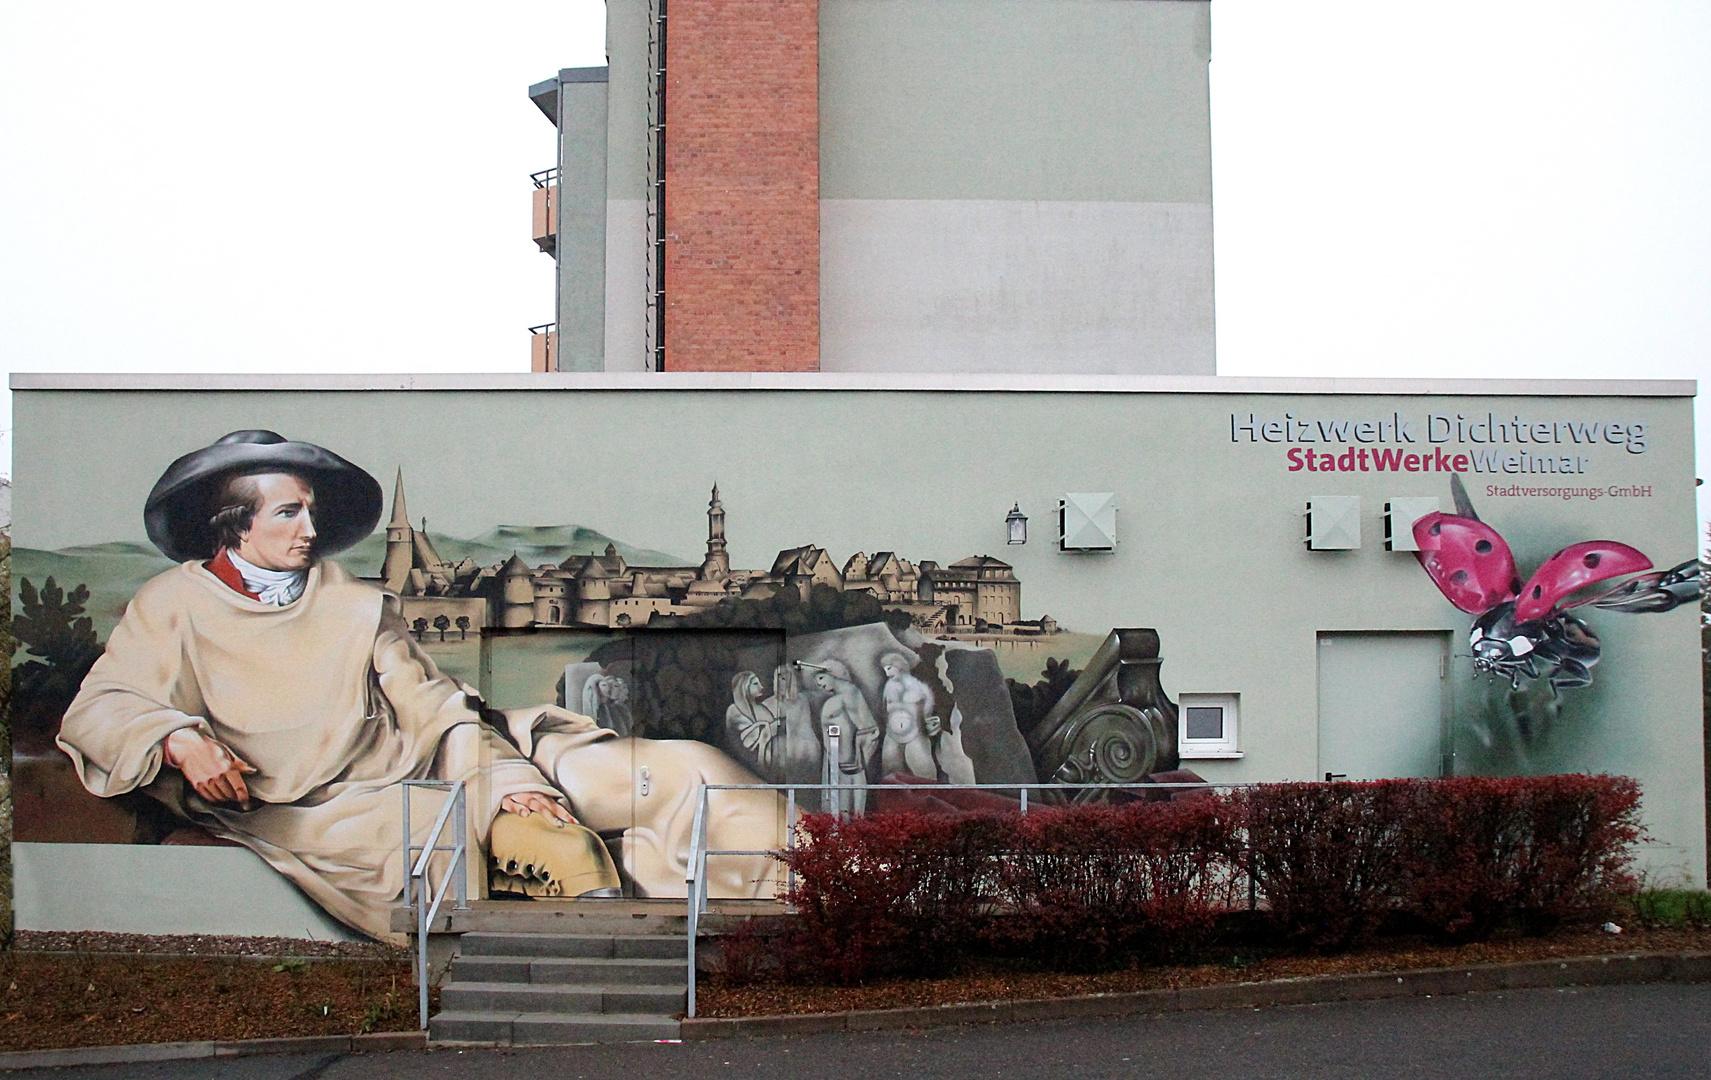 Goethe, wo auch immer man hinsieht in Weimar